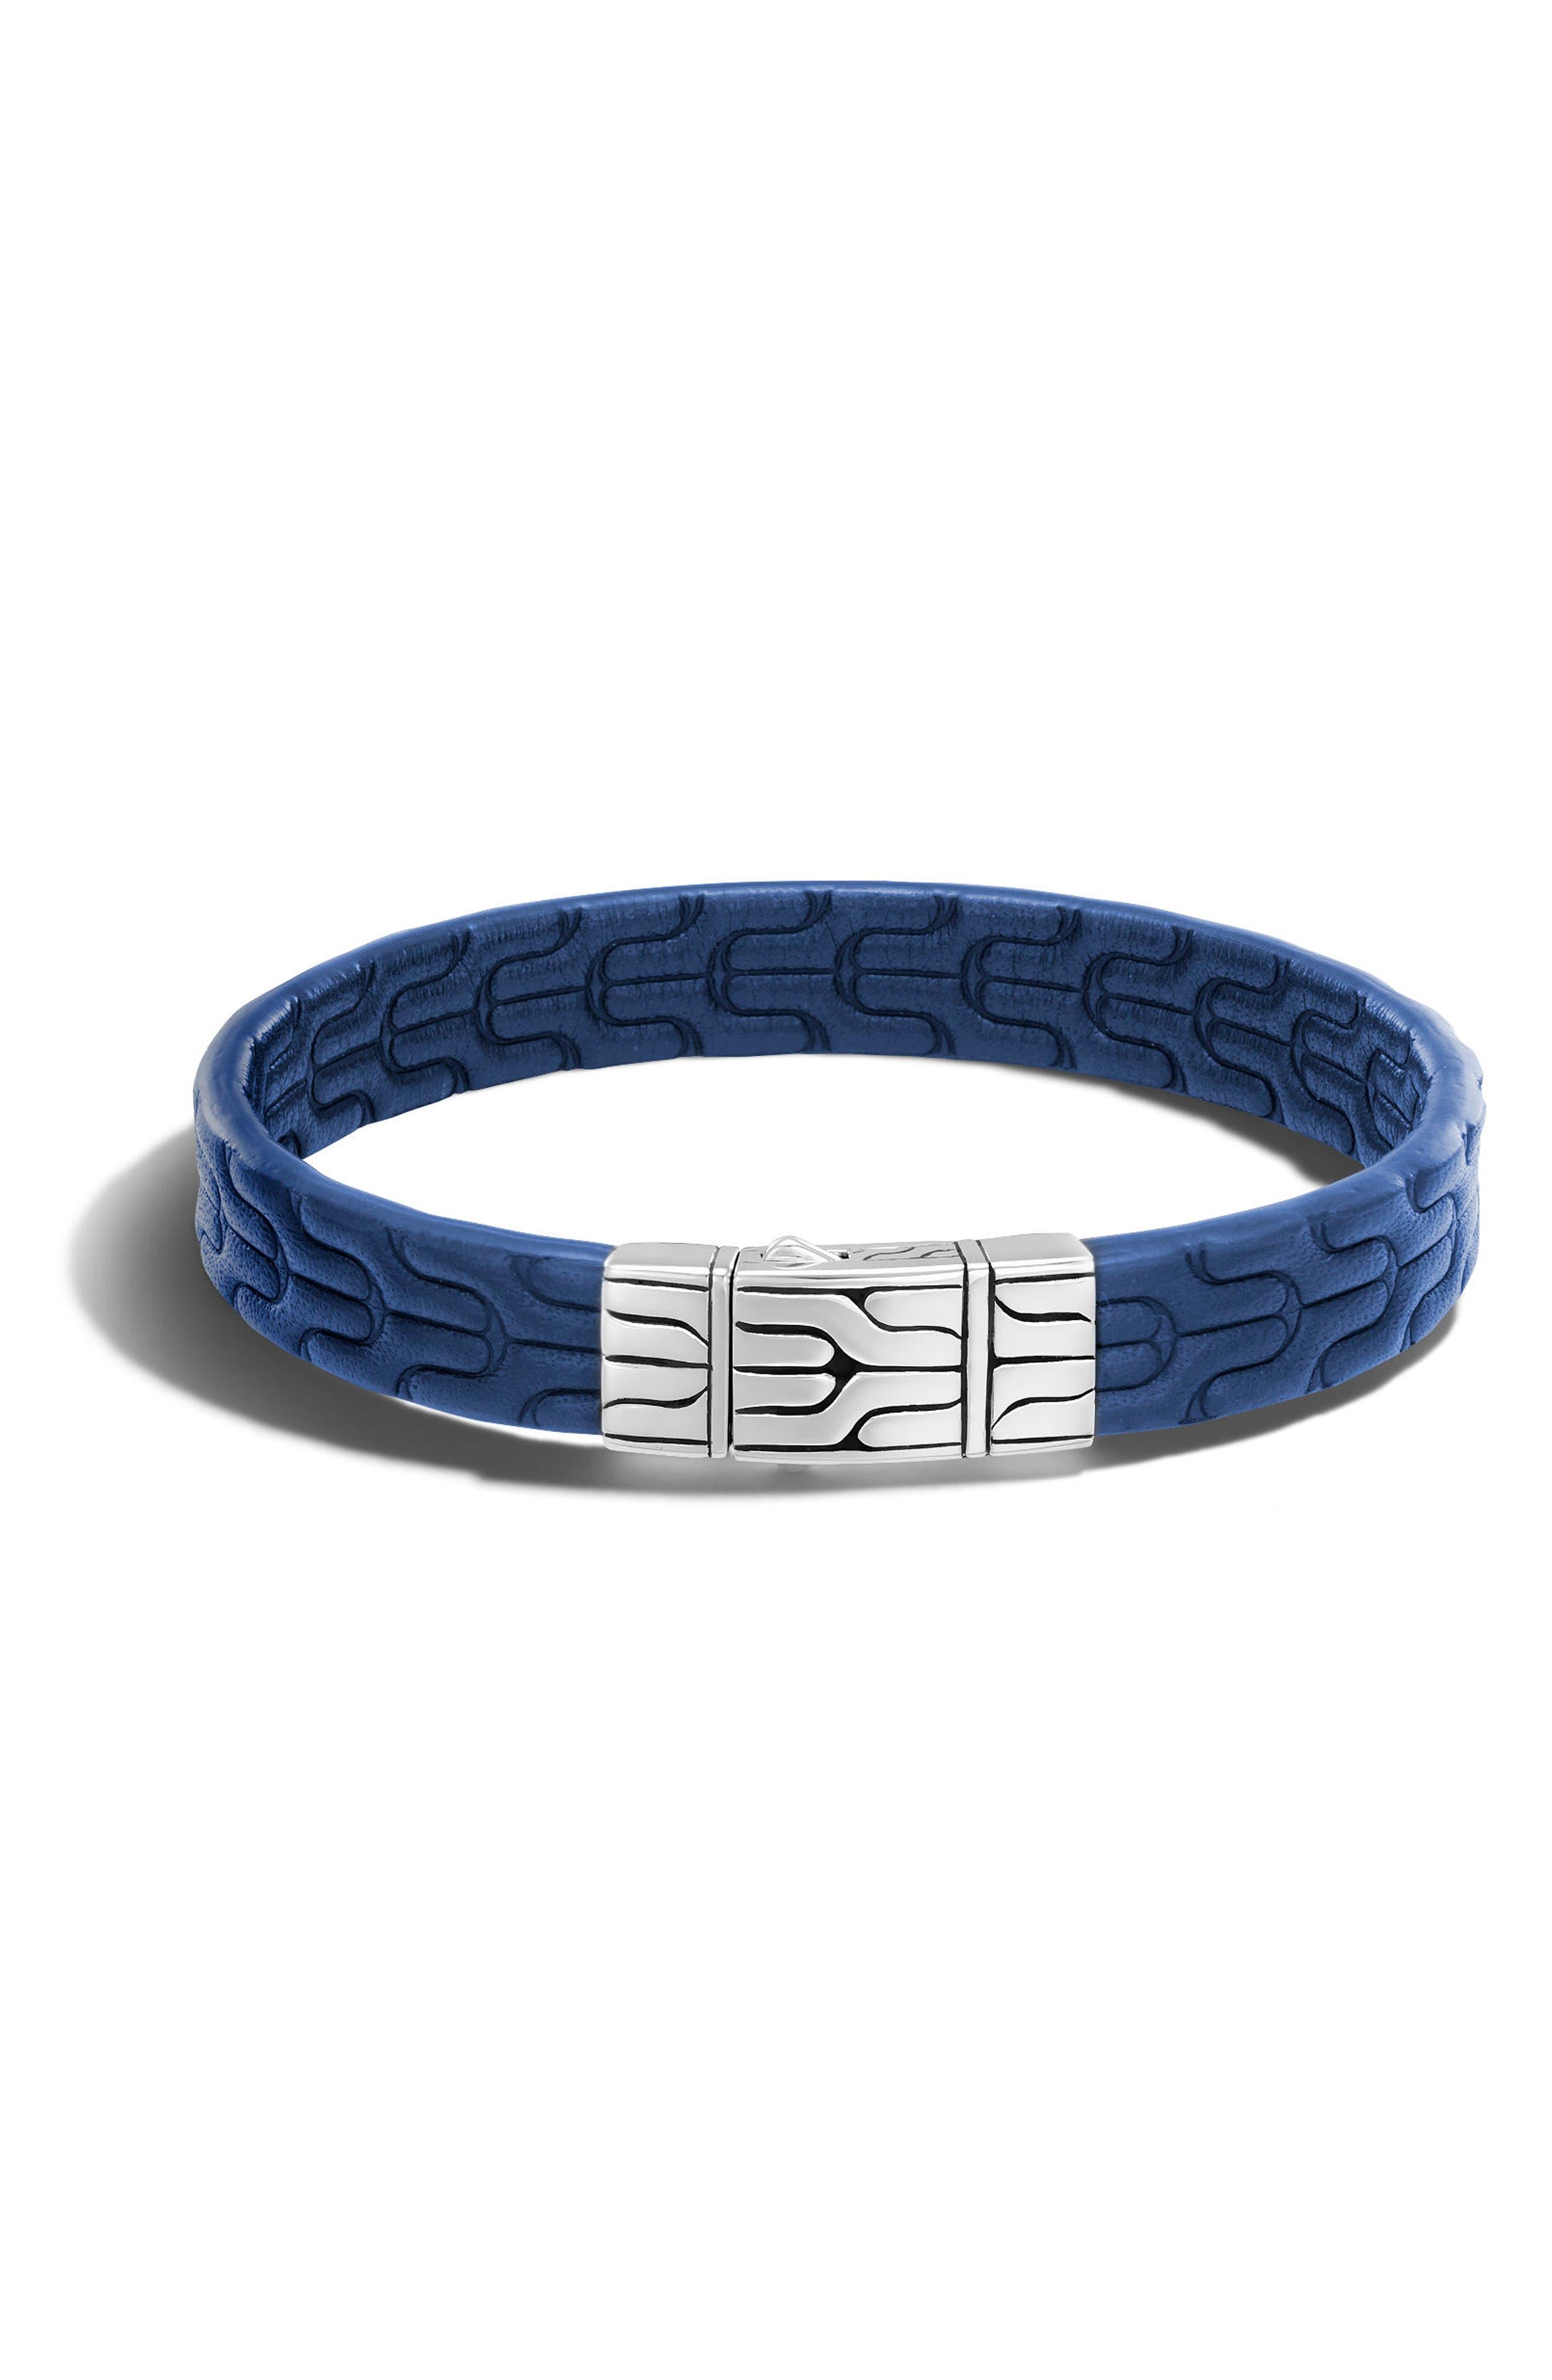 Embossed Leather Bracelet,                             Main thumbnail 1, color,                             Silver/ Blue